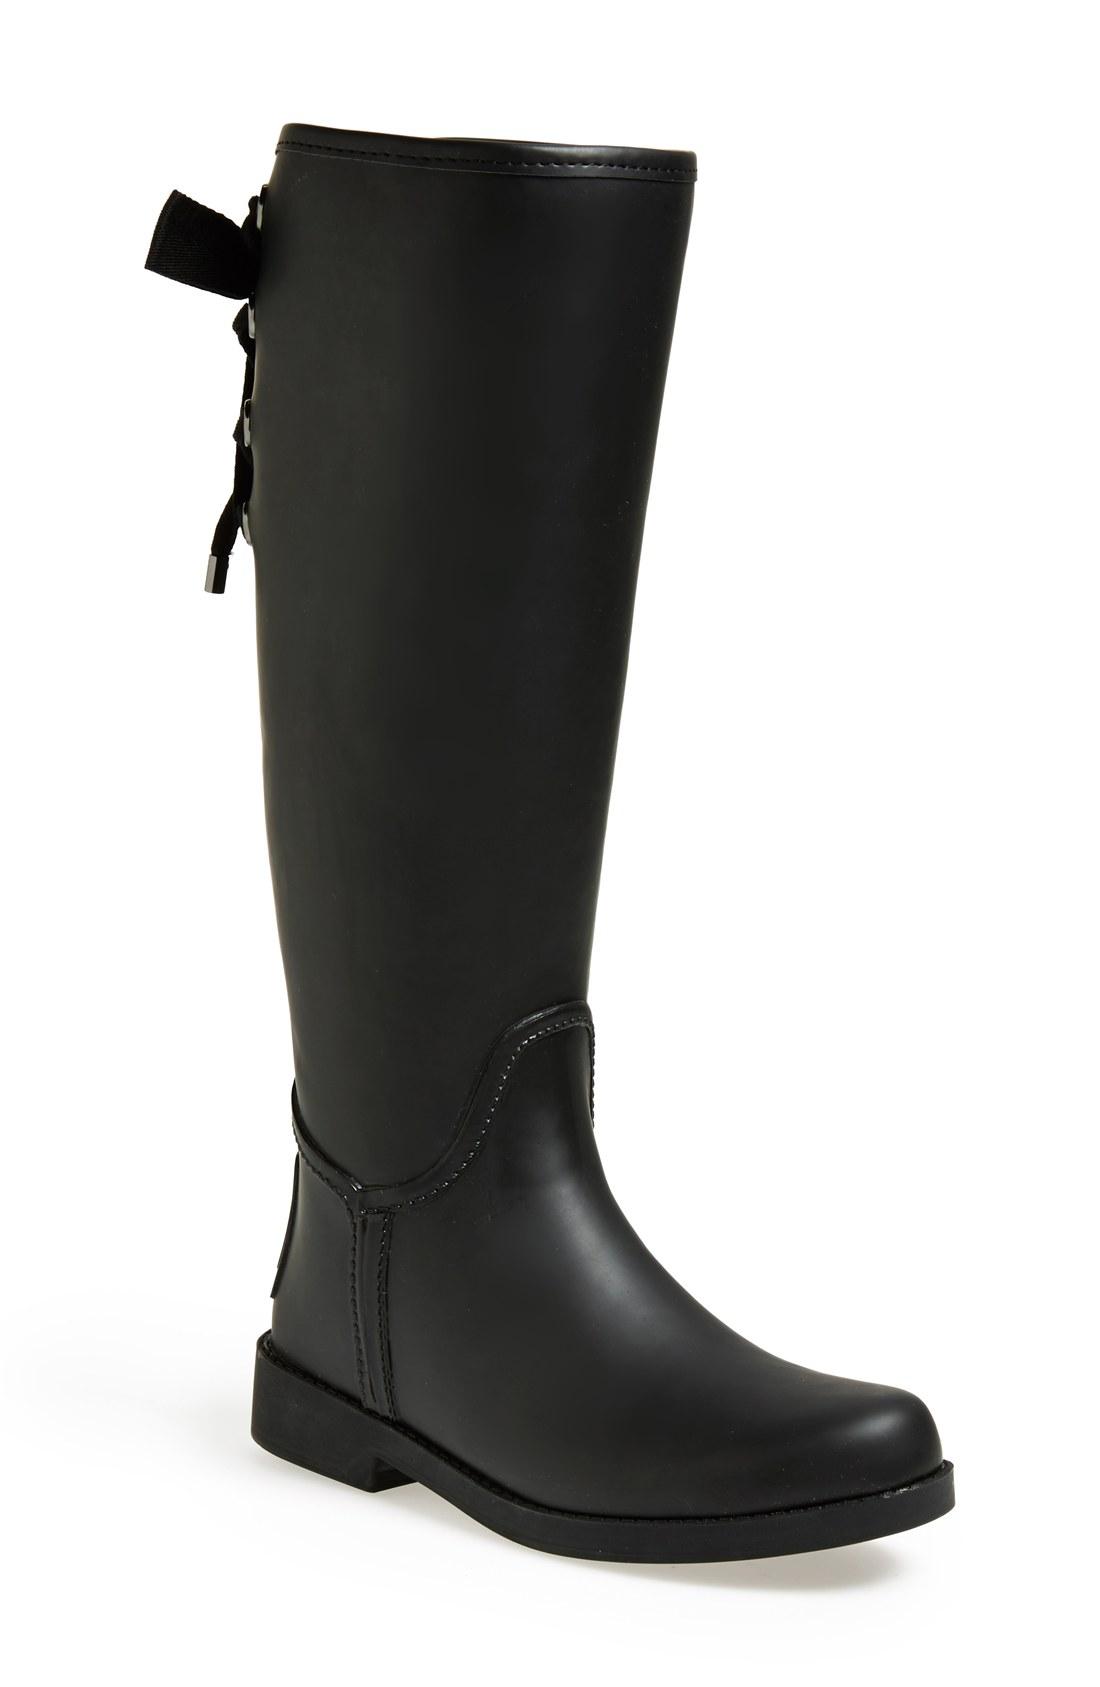 coach u0027tristeeu0027 waterproof rain boot | nordstrom ORVIERJ